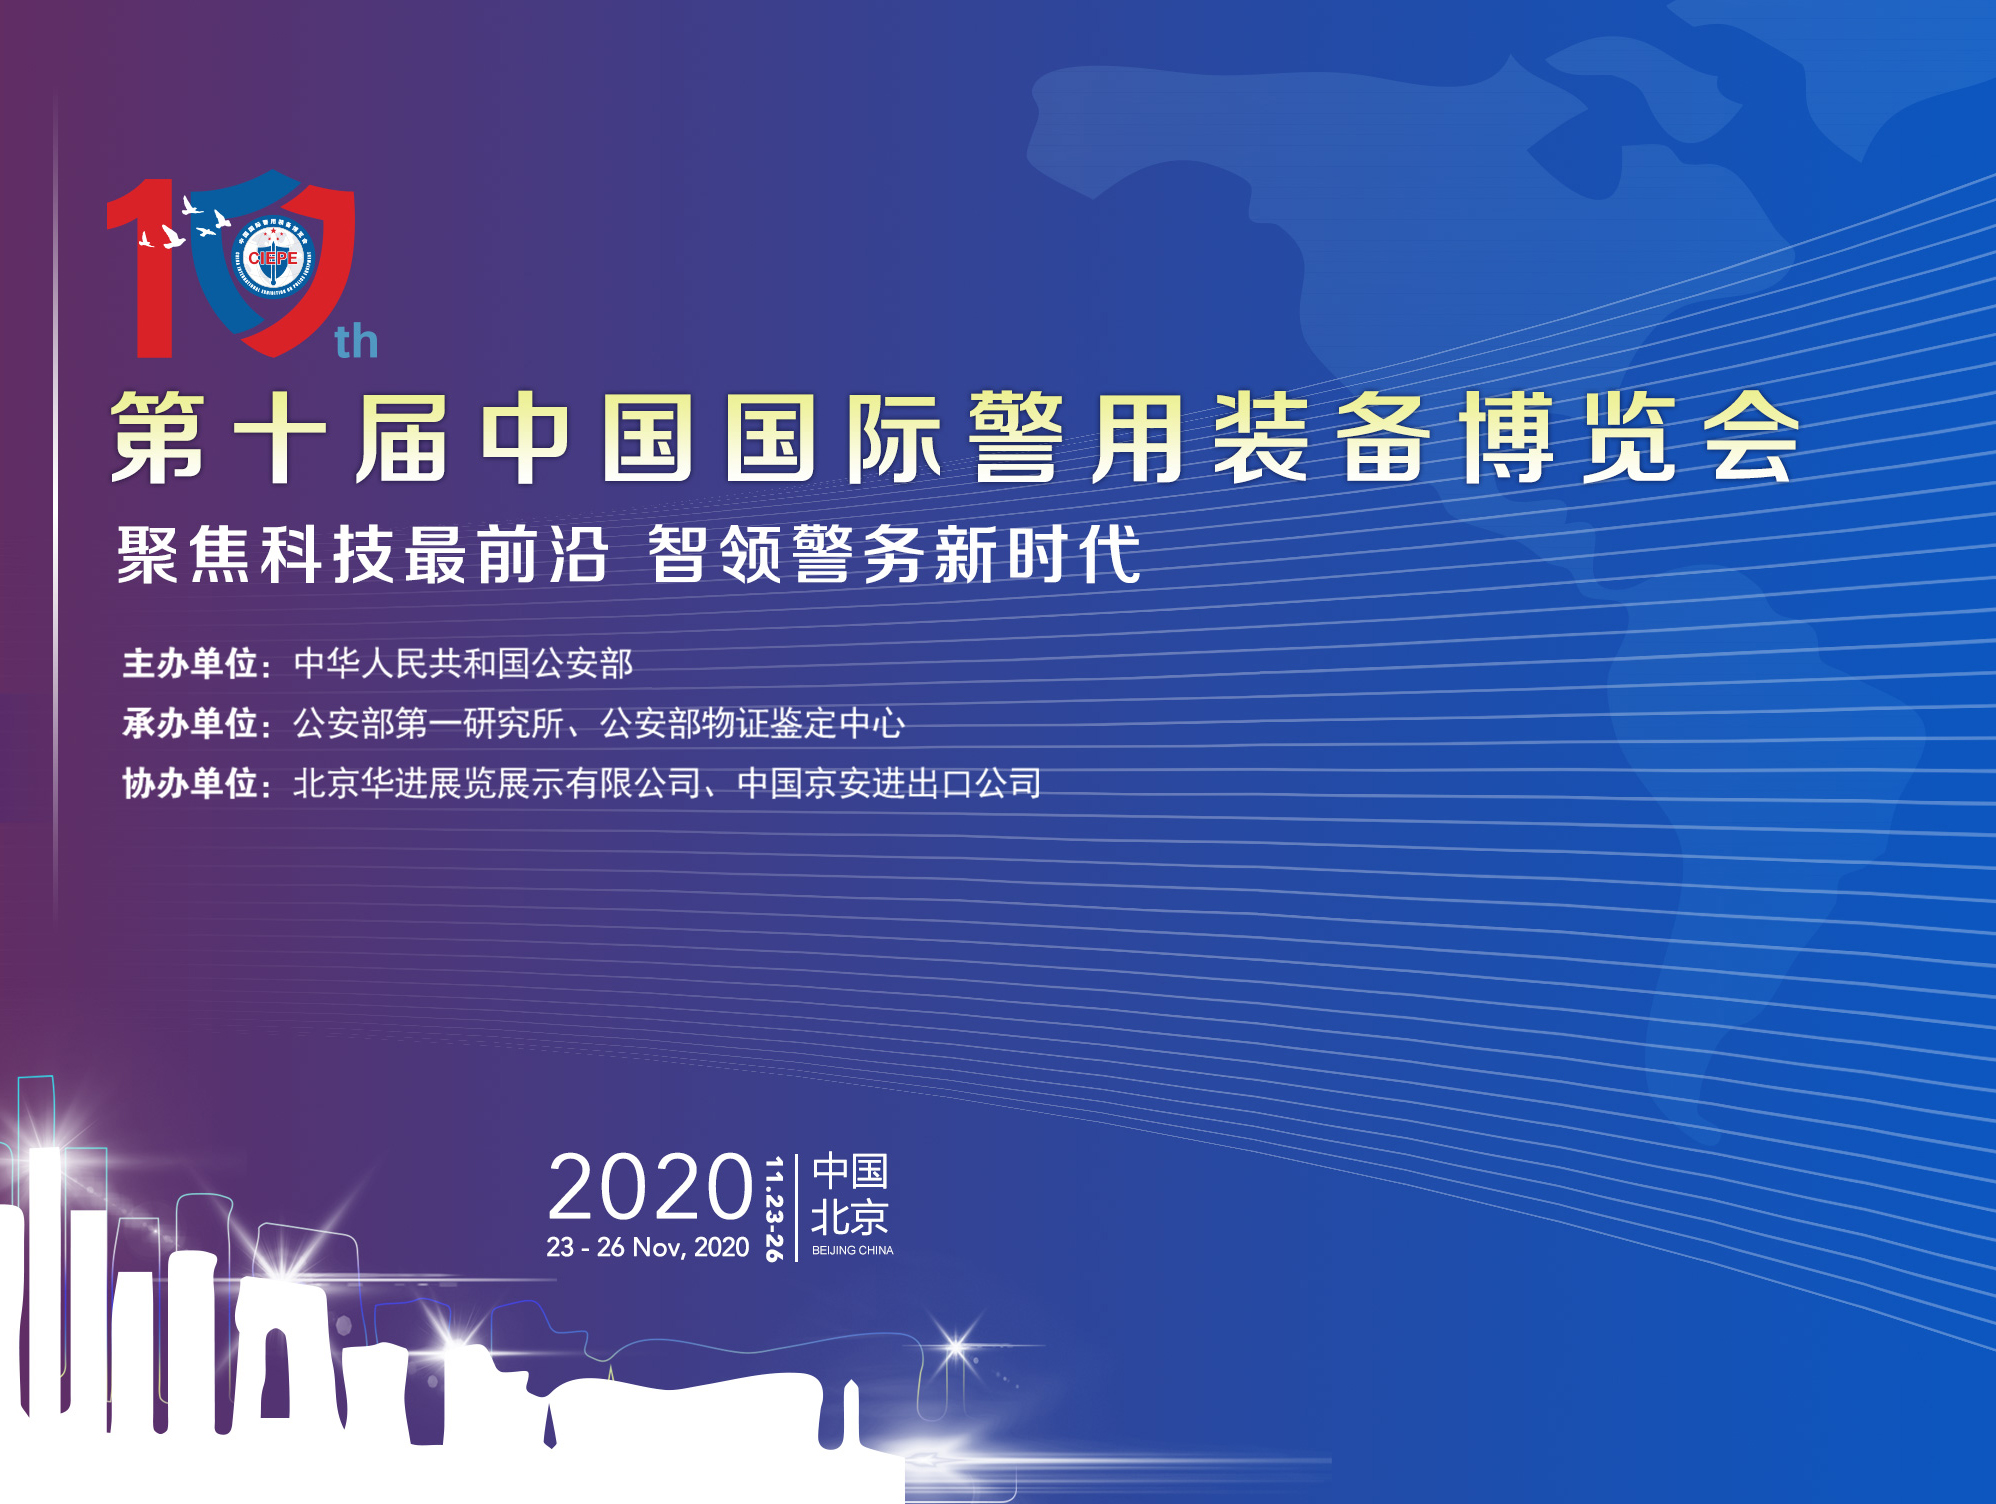 CTID平台即将亮相第十届中国国际警用装备博览会!